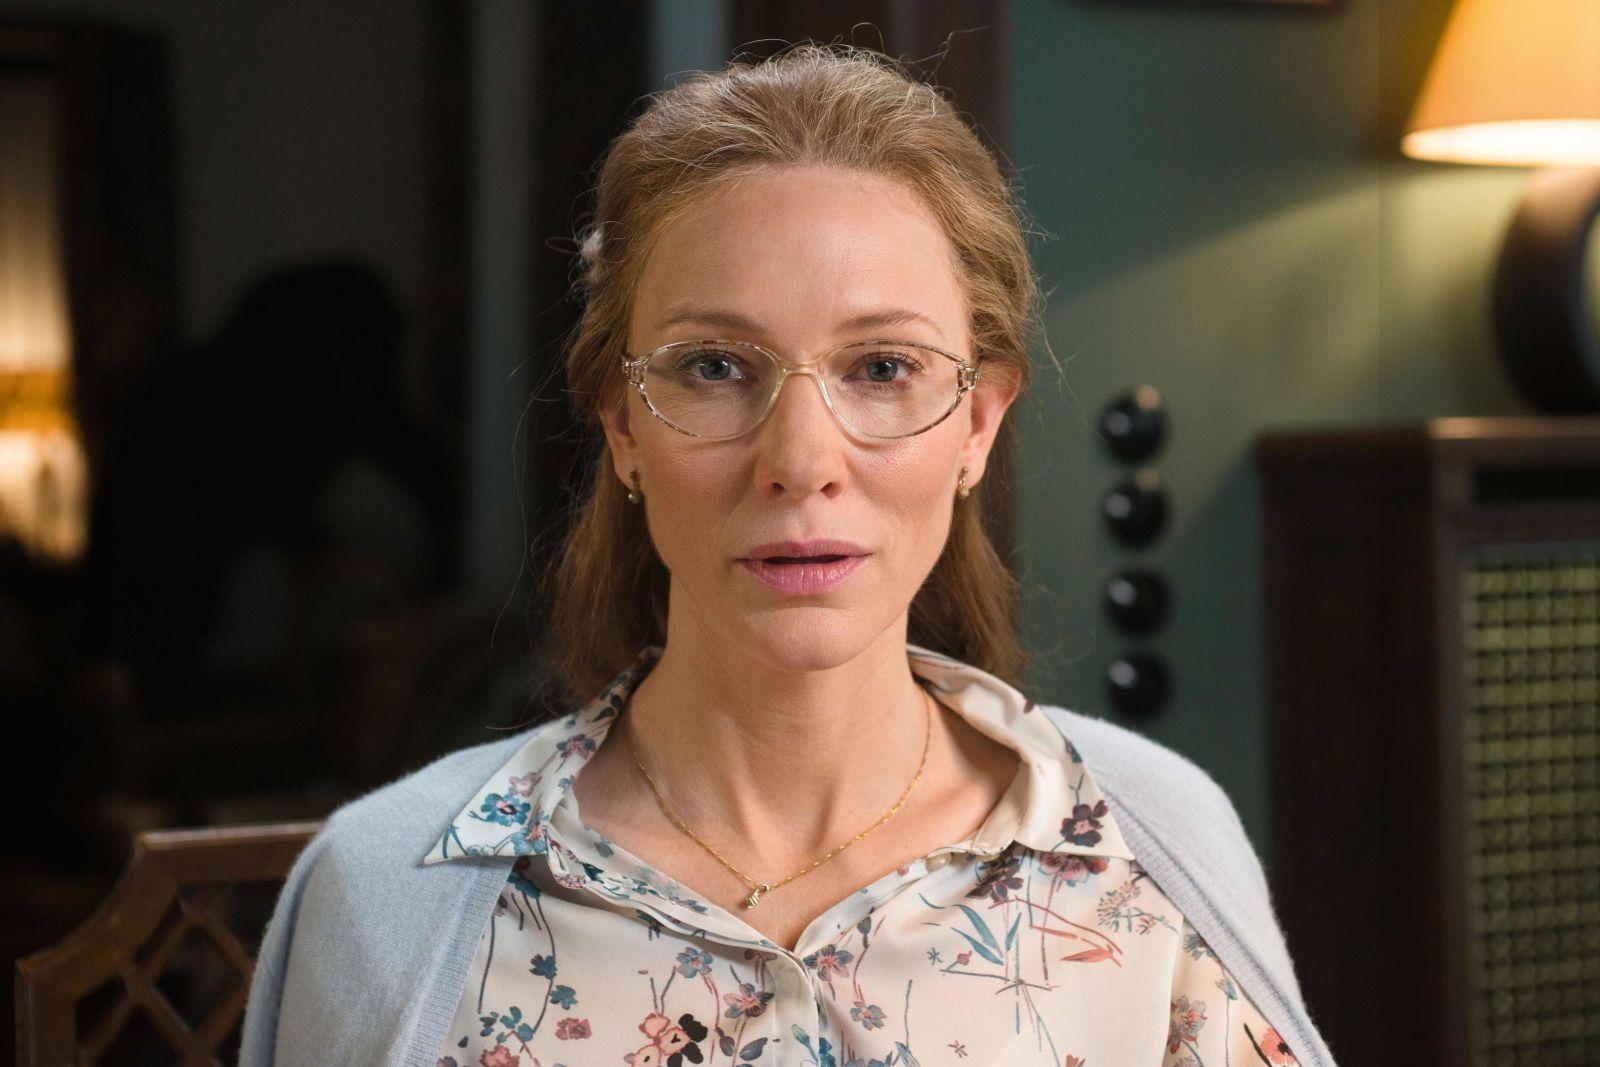 Cate Blanchett Transforms Into 13 Characters In The Hypnotic Manifesto Cate Blanchett Manifesto Cate Blanchett Actor Headshots